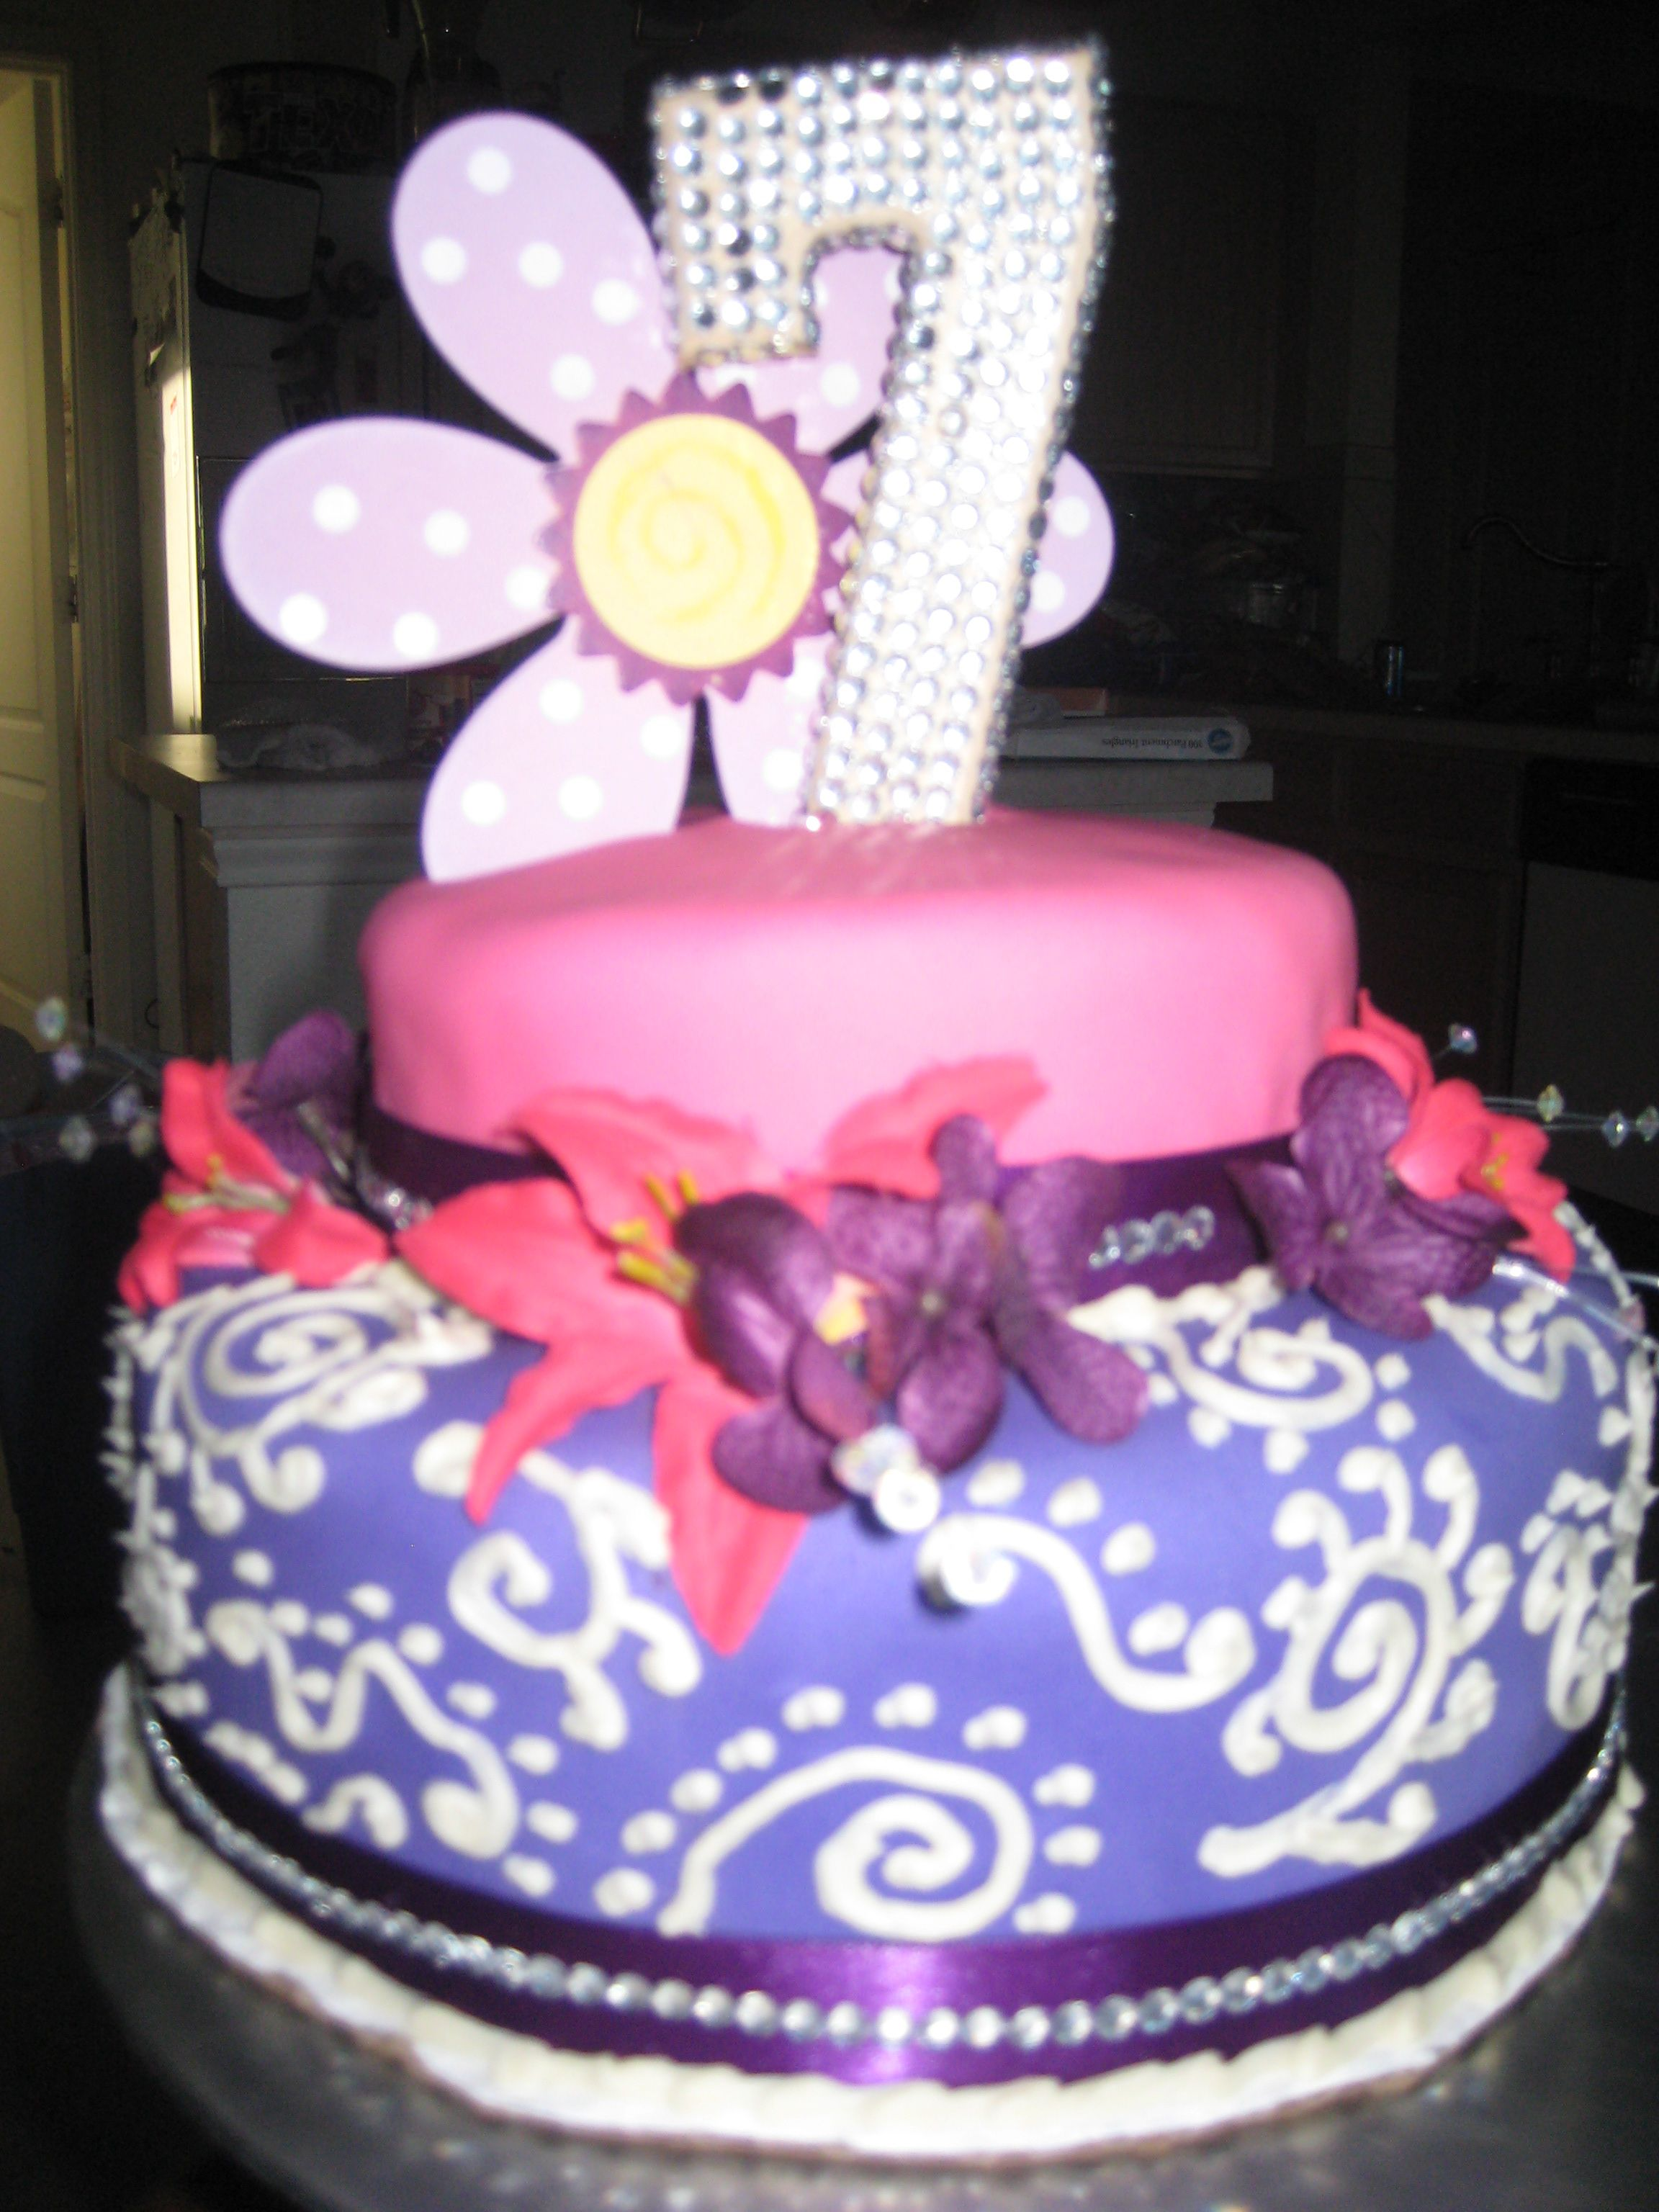 7 Year Old Boy Birthday Cakes